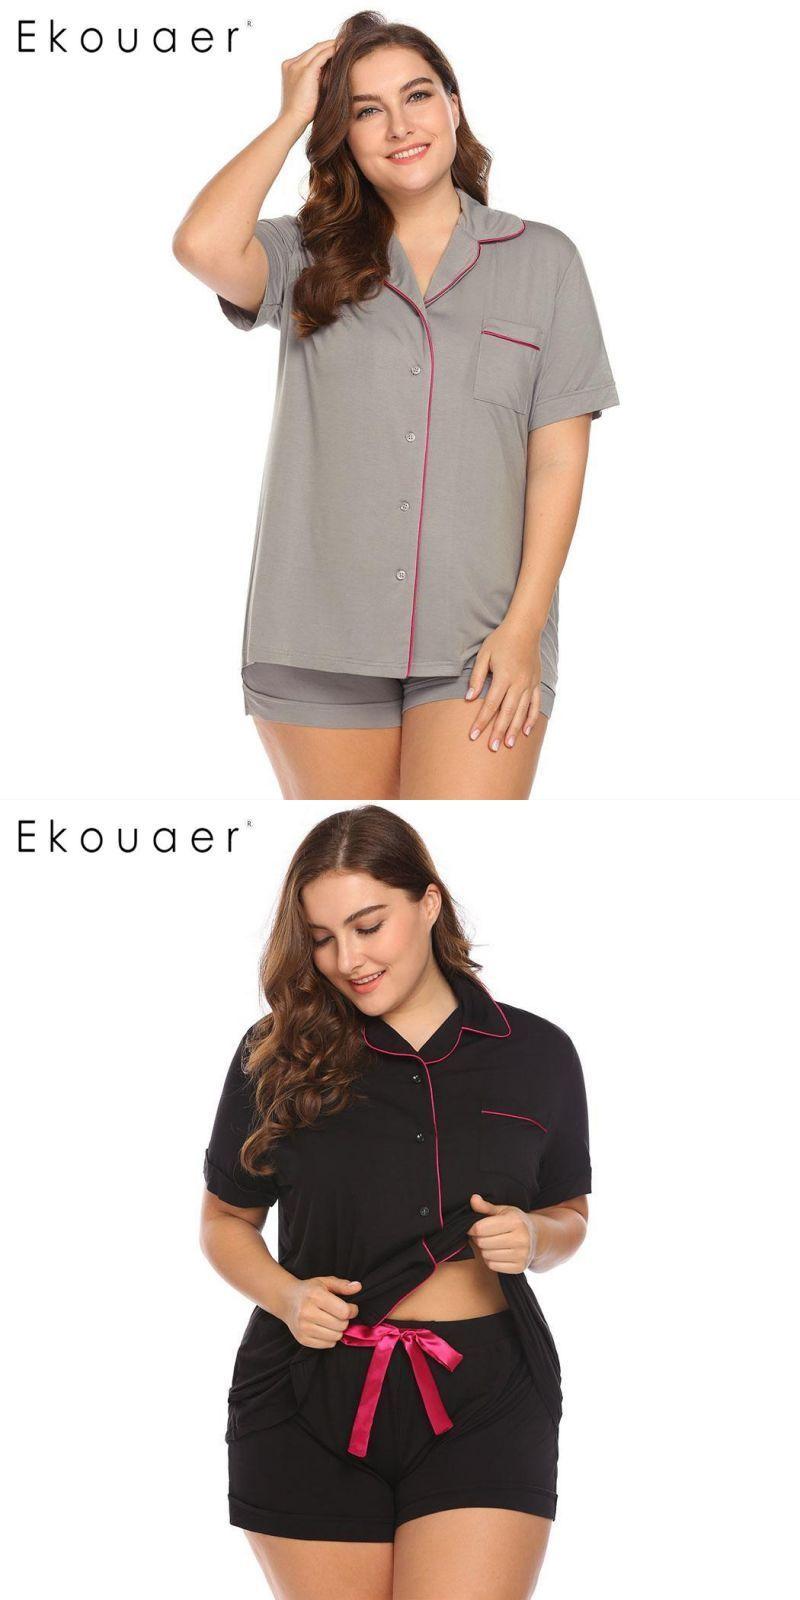 Plus size pajamas set women sleepwear short sleeve lapel collar button down  shirts and shorts nightwear suits xl-4xl  women  pajamas  turn-down  collar  ... 5f1c4e88f